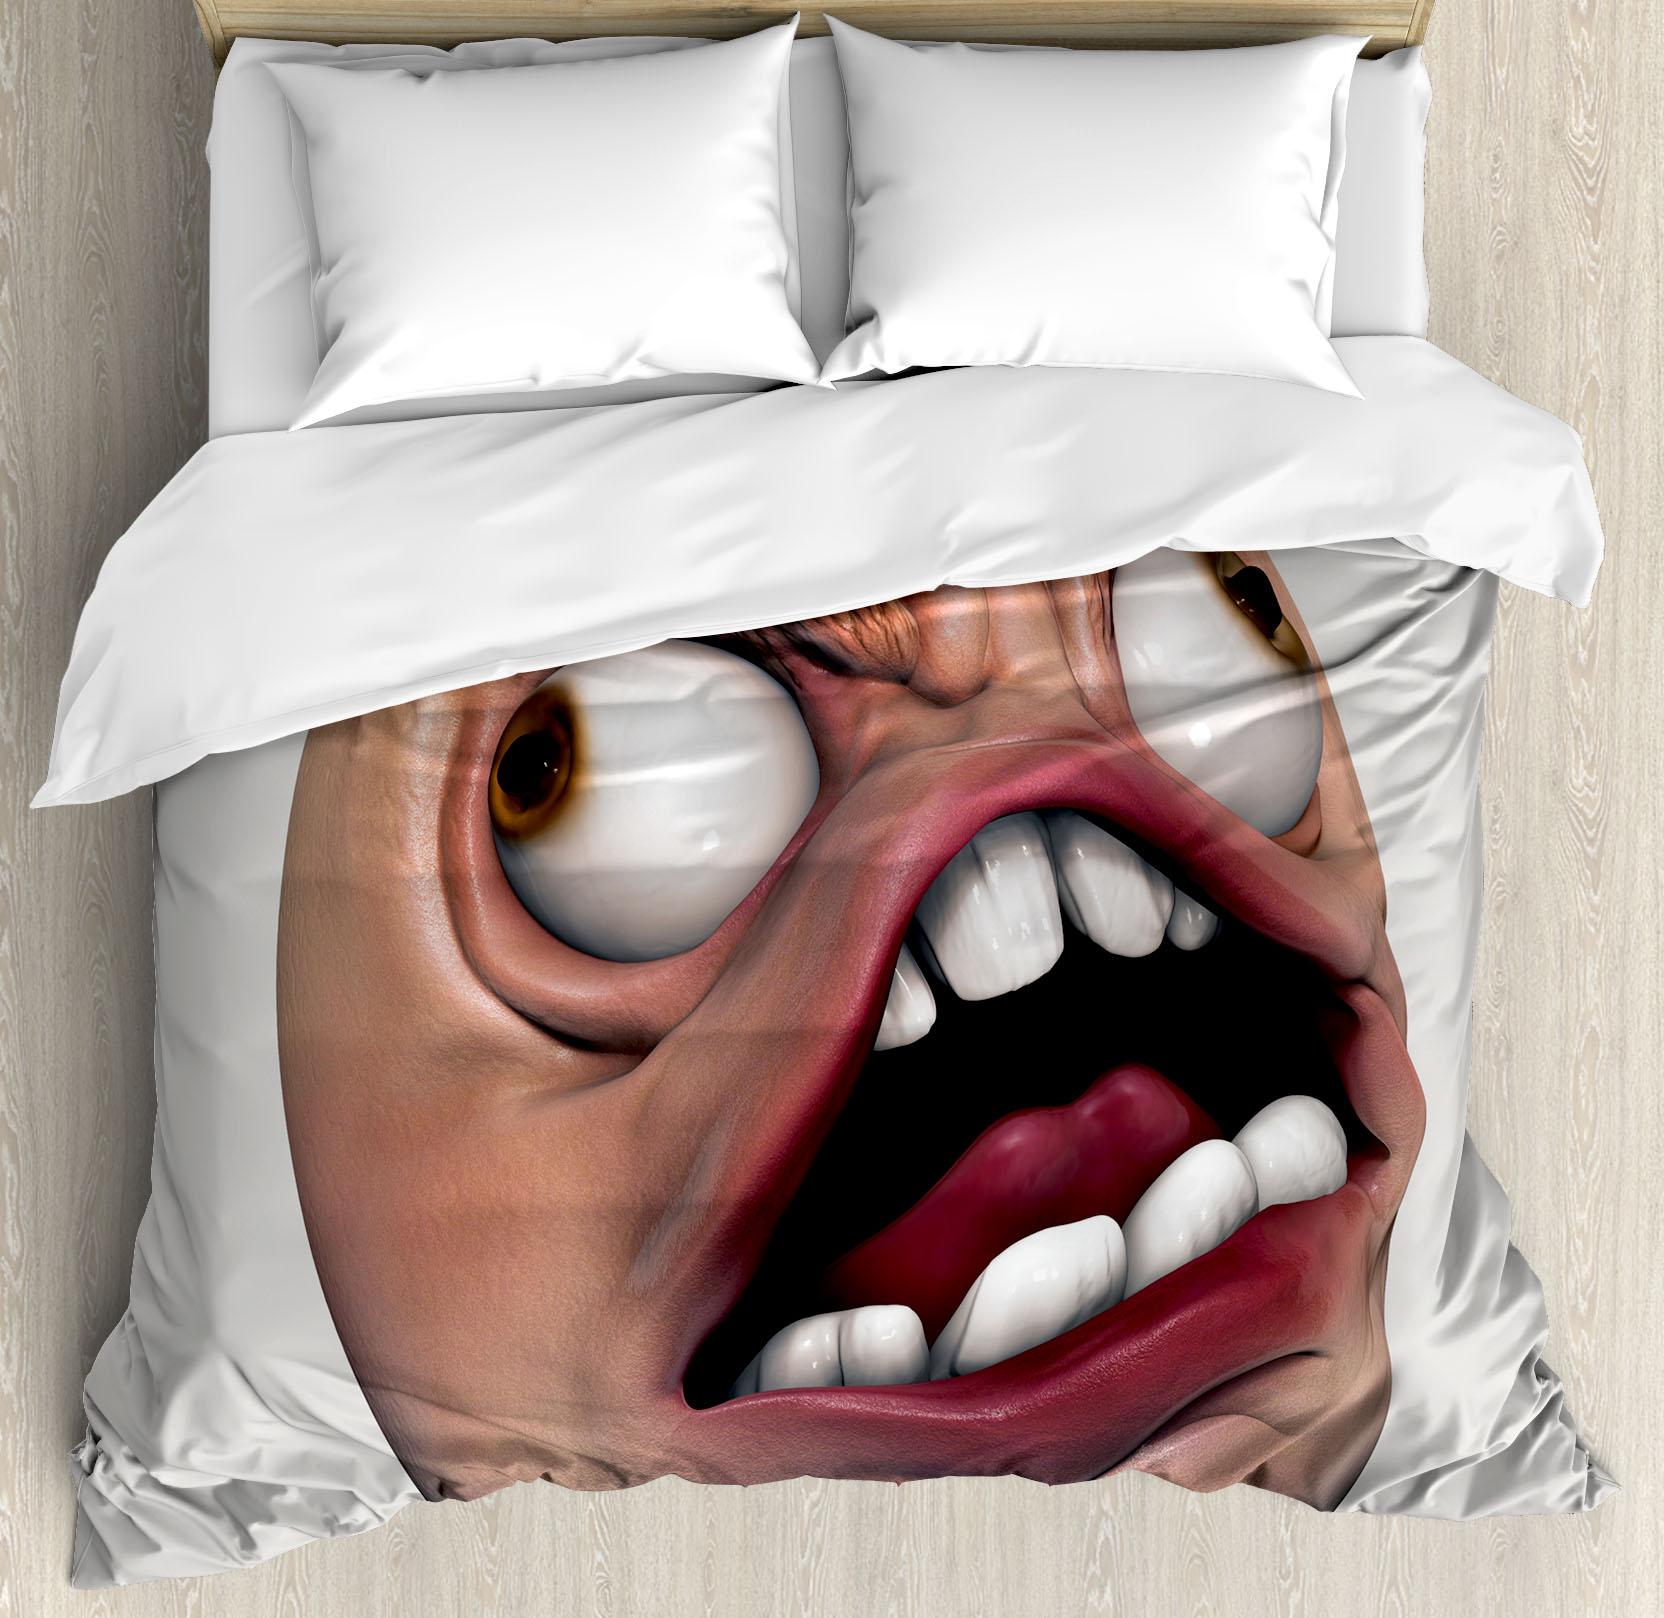 Humor Decor Queen Size Duvet Cover Set Angry Rage Guy Meme Bad Hair